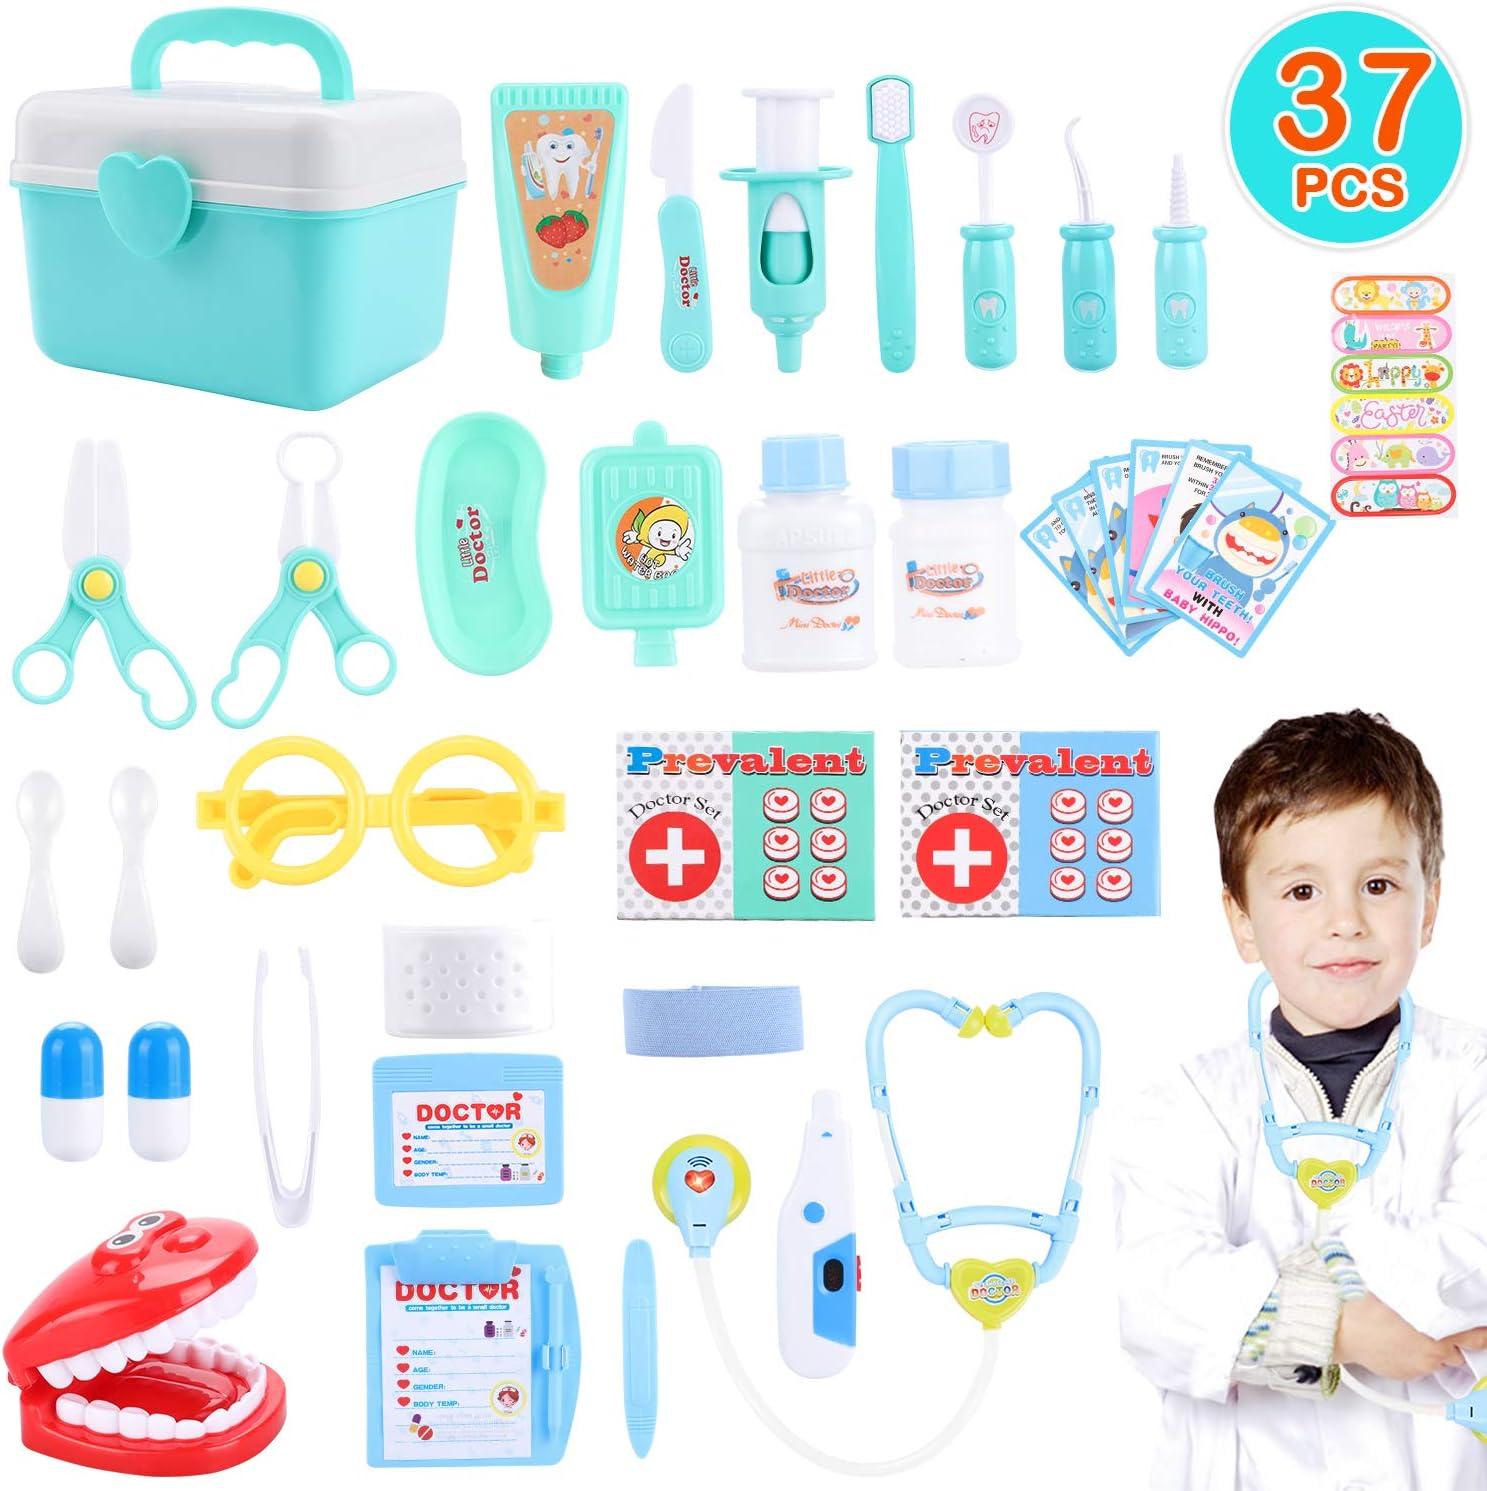 Maletín Doctor, joylink 37Pcs Doctora Juguetes Cuadro Médico Conjunto Enfermera Médico Kit Juego de Rol Cuadro Médico Maletín de Médico Juegos de médicos para Niñas Niños